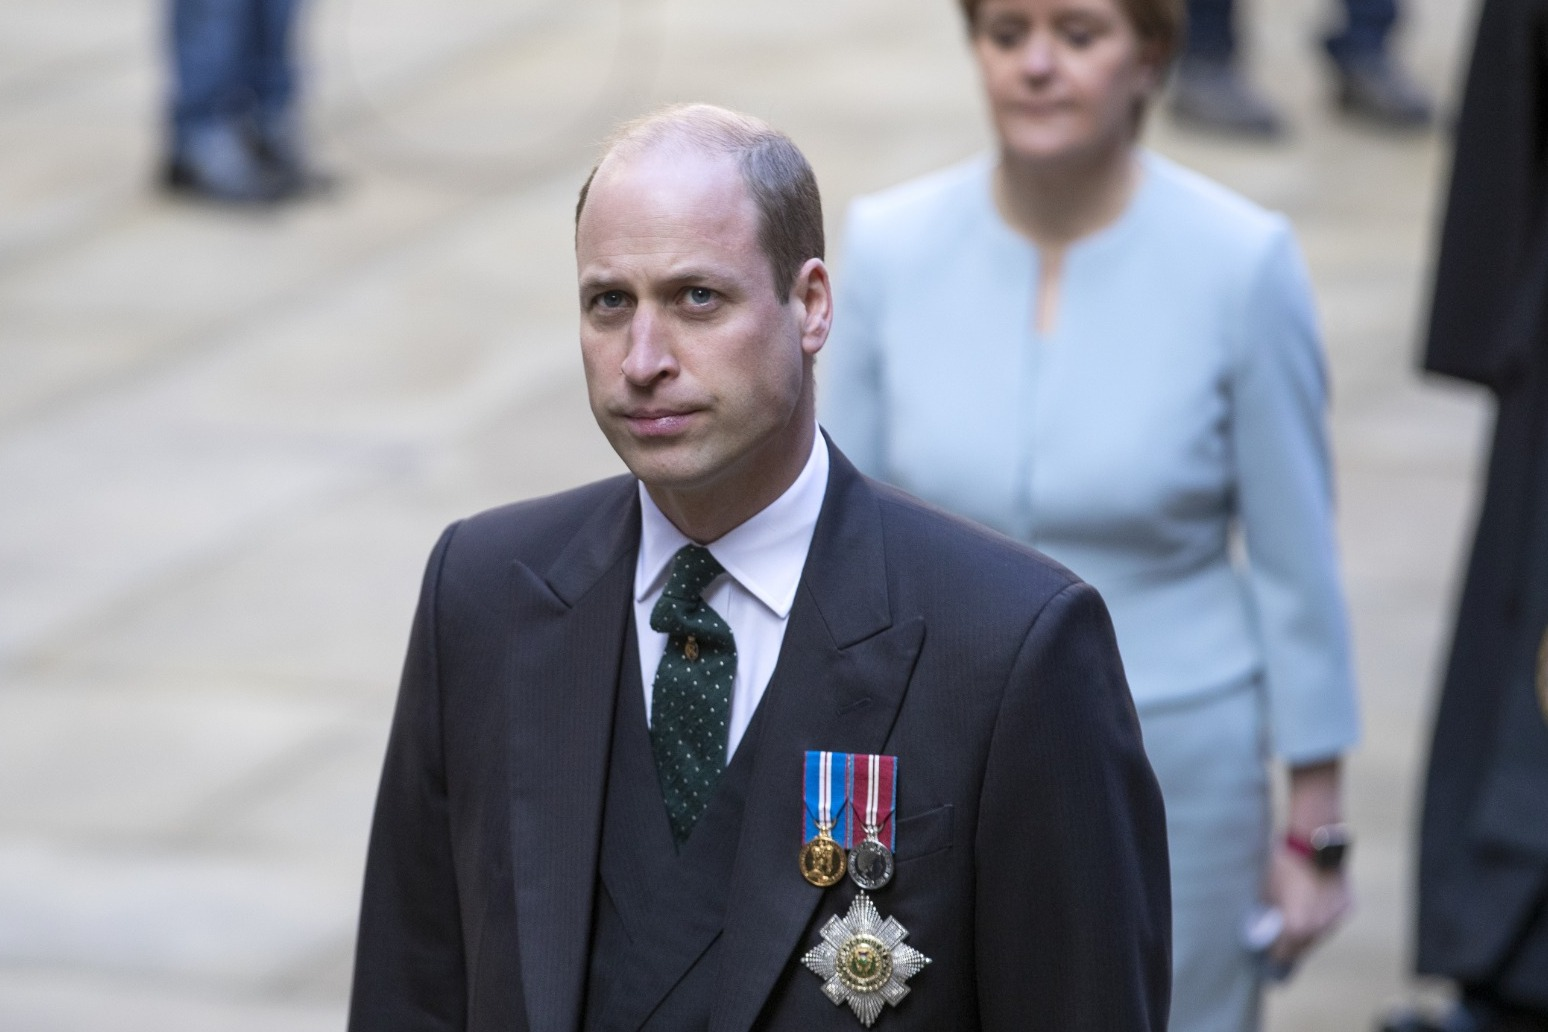 Duke of Cambridge says Scotland source of saddest and happiest memories